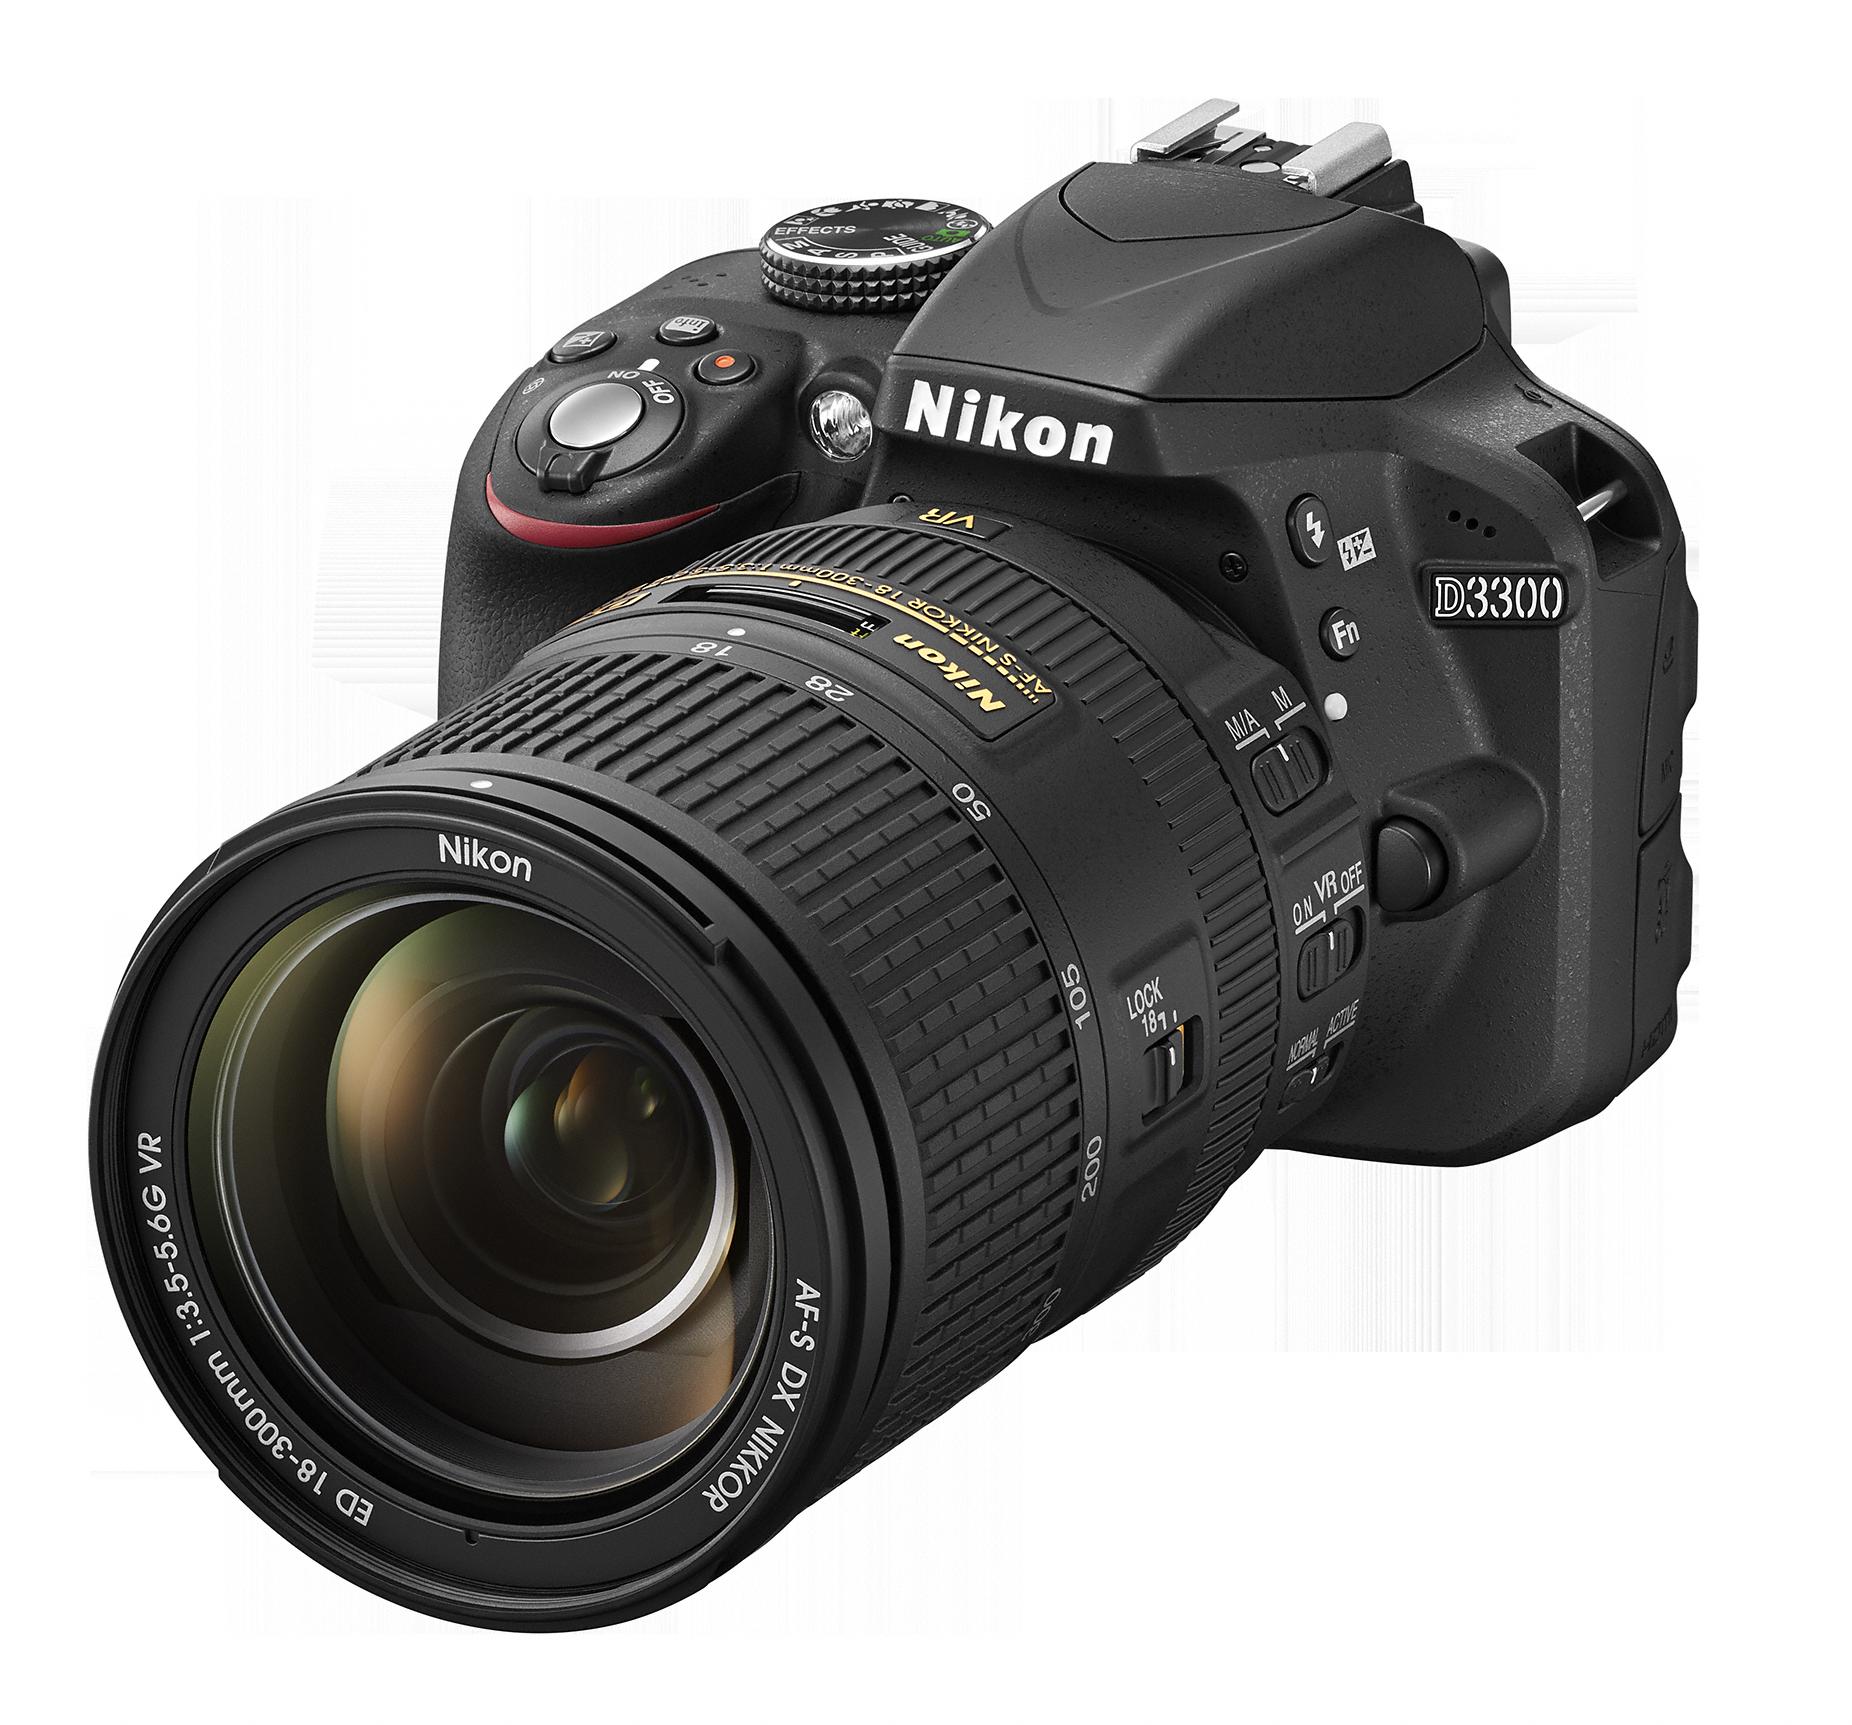 D3300_Bk_18_300.png - Nikon, Transparent background PNG HD thumbnail